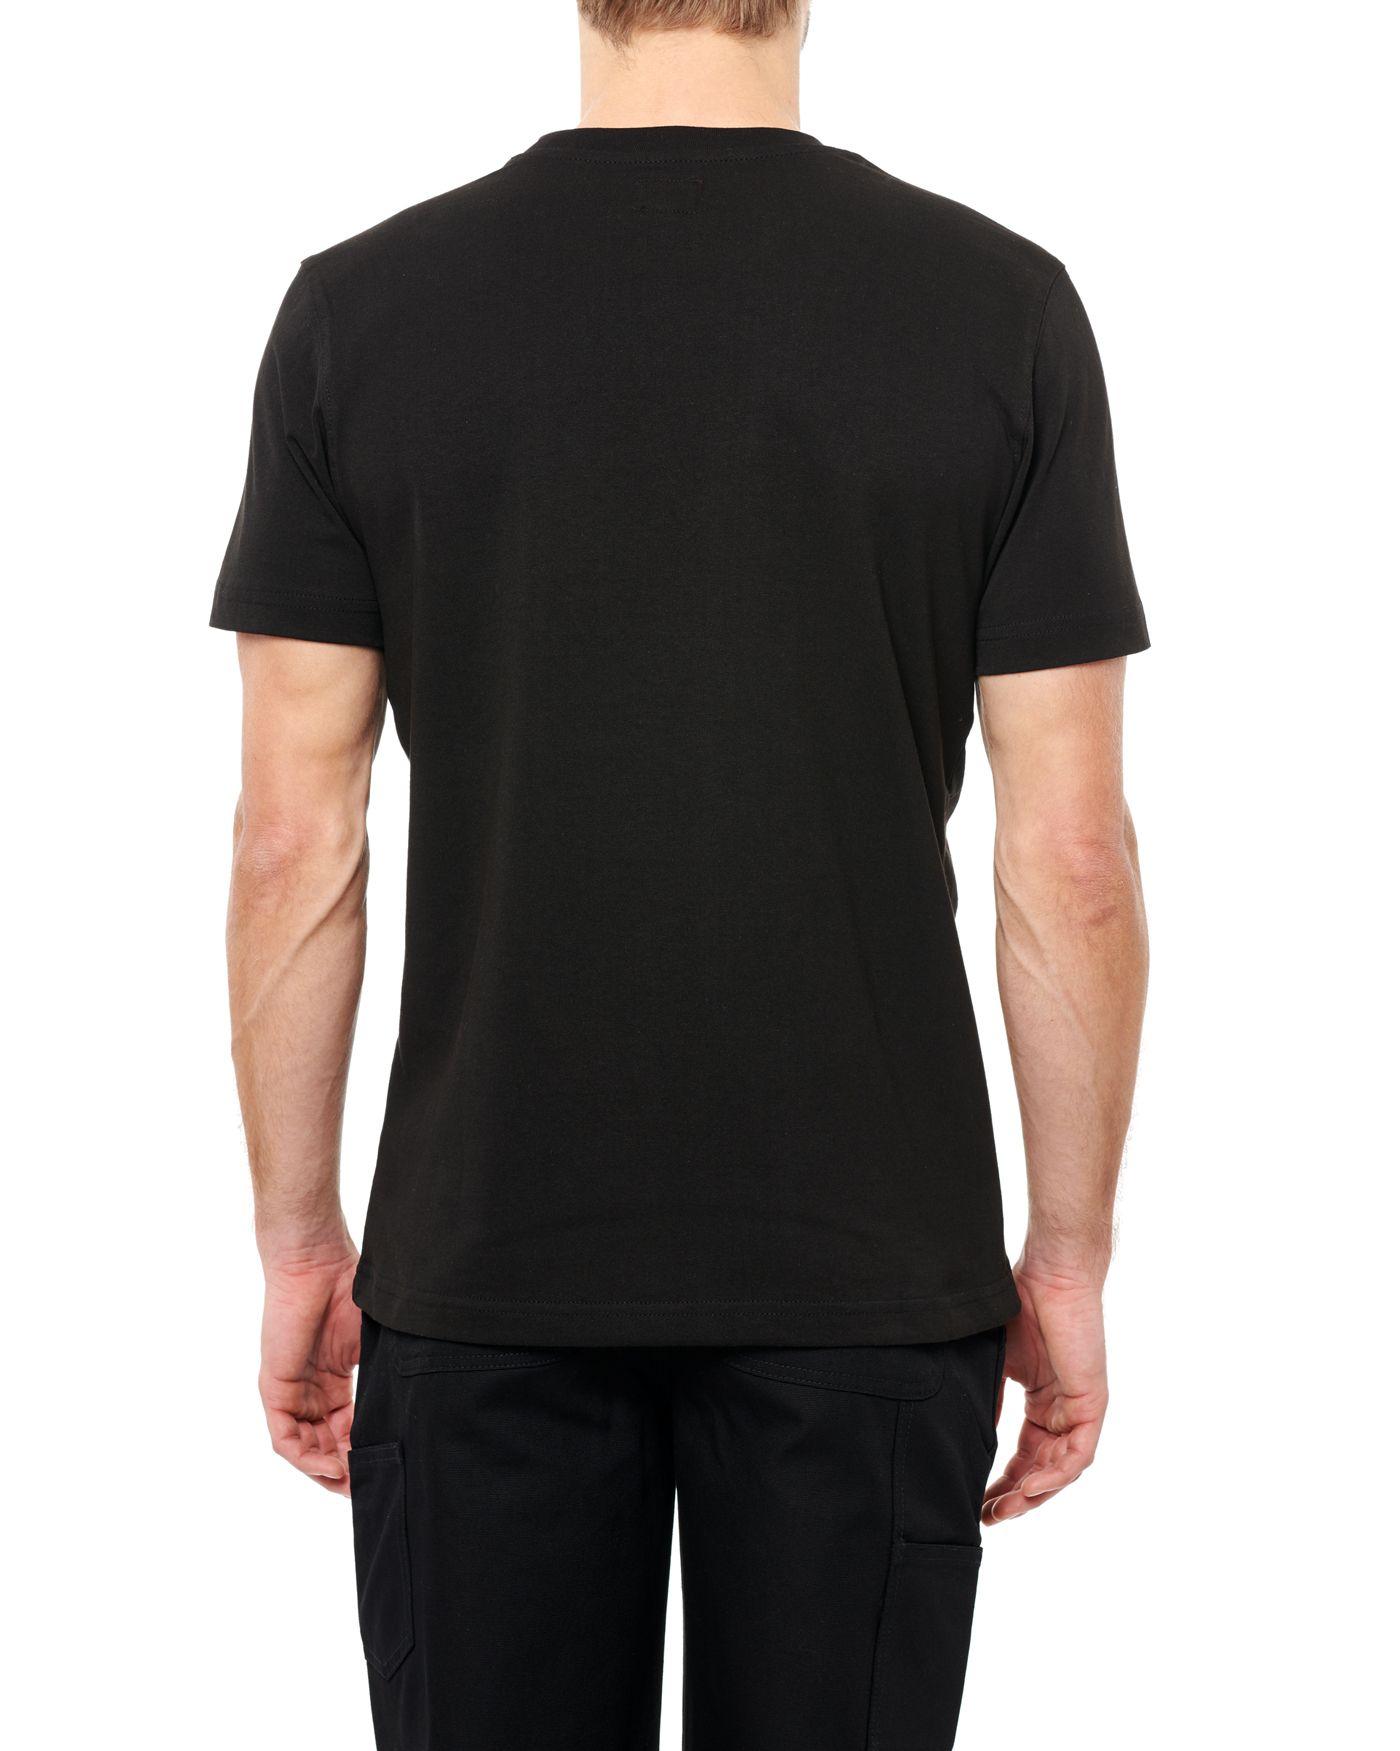 Photo of Retro Wheels S/S T-shirt, Black